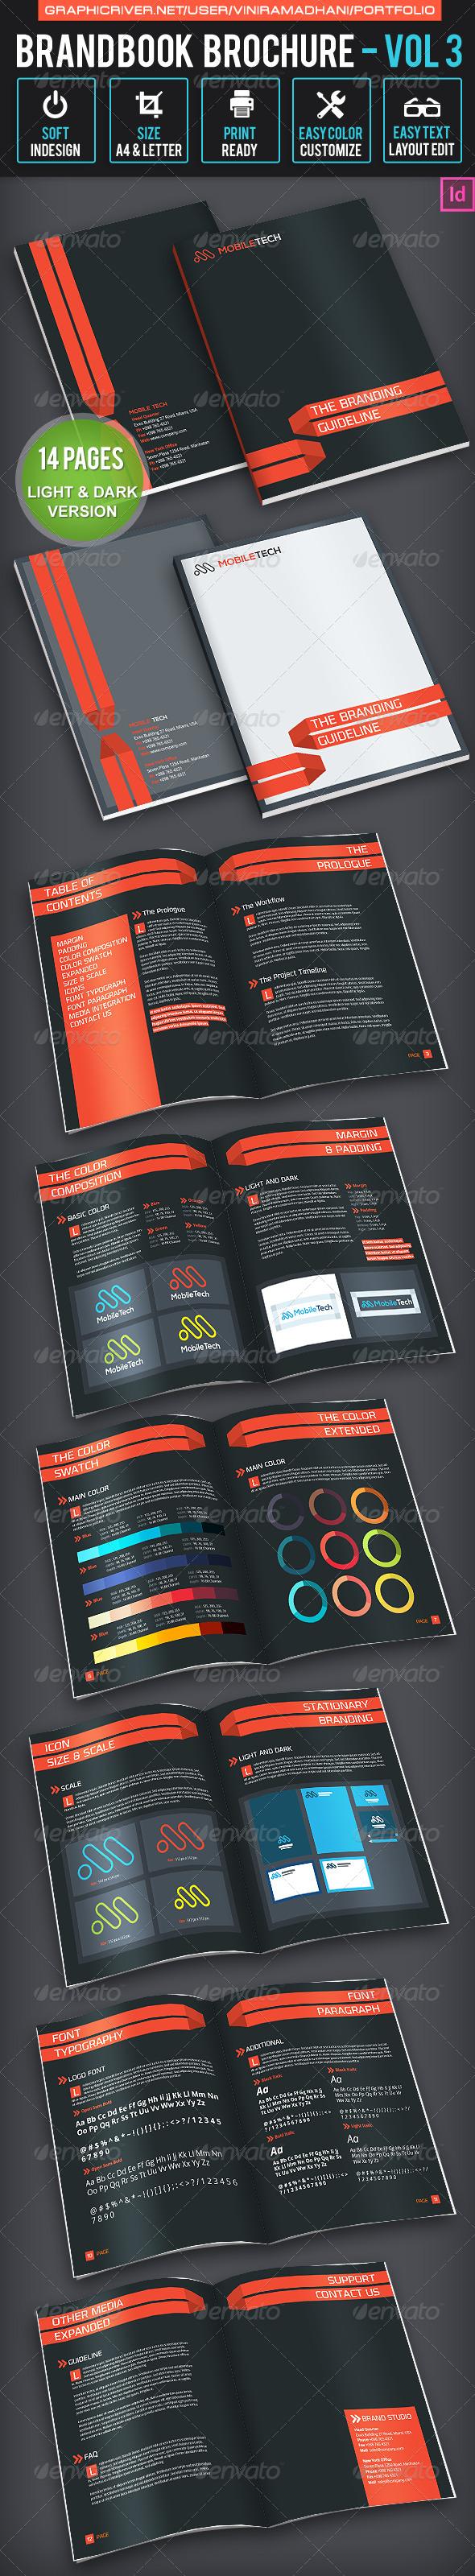 GraphicRiver Brandbook Brochure Volume 3 6524244